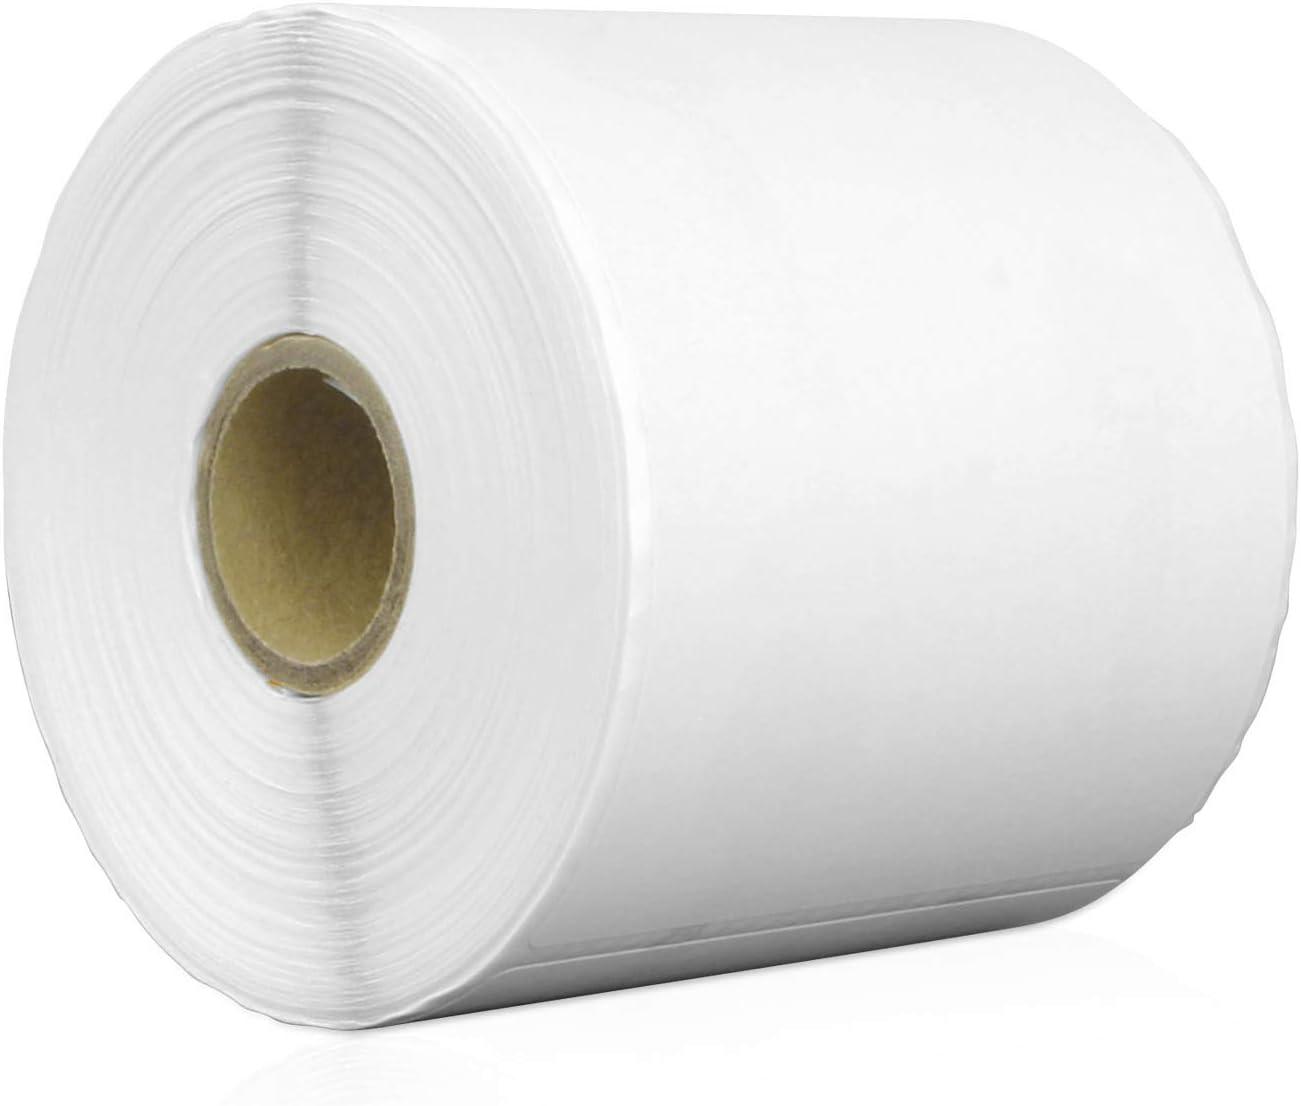 WHITE Labels 100mm x 38mm 1,000 Zebra Type Printer Labels 100x38